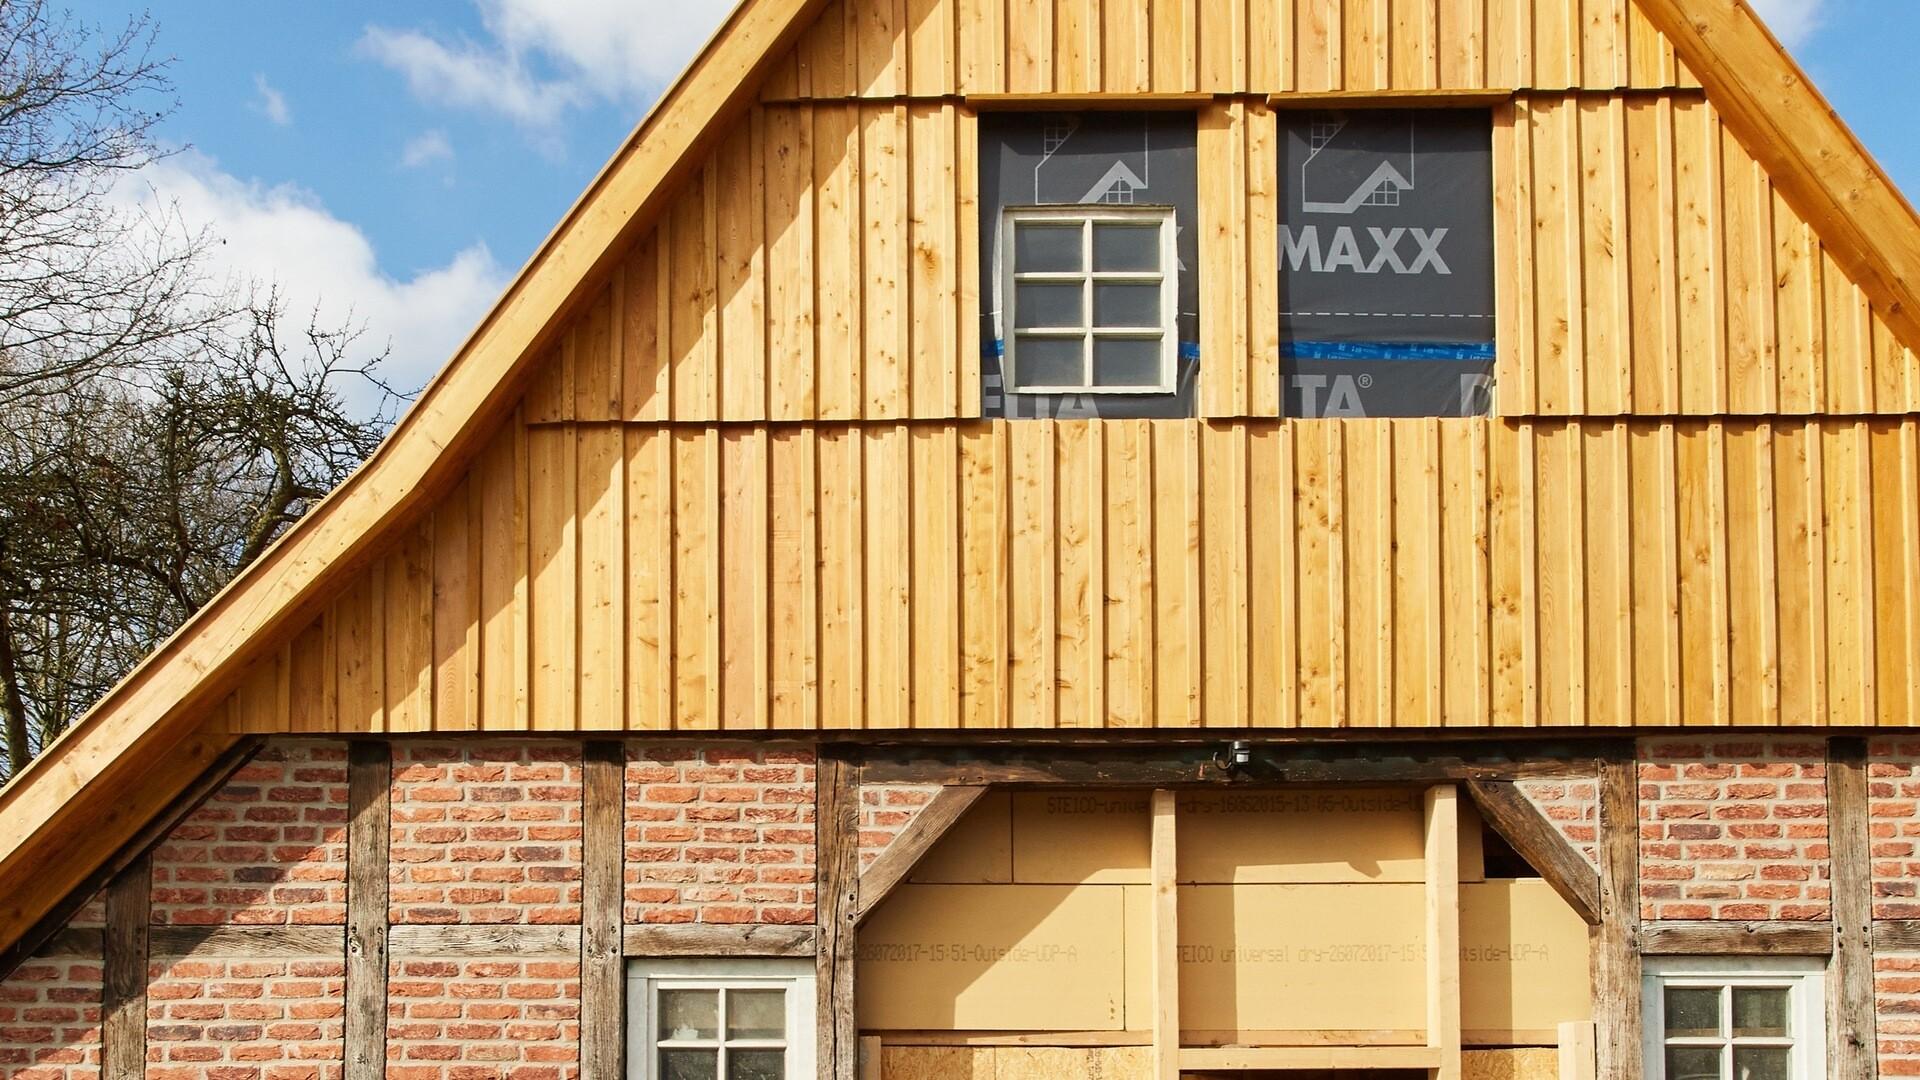 lienen, renovation timbered house, interior wall insulation, blow-in insulation, fillrock, fire resistance, fachwerkhaus, press, presse, Germany